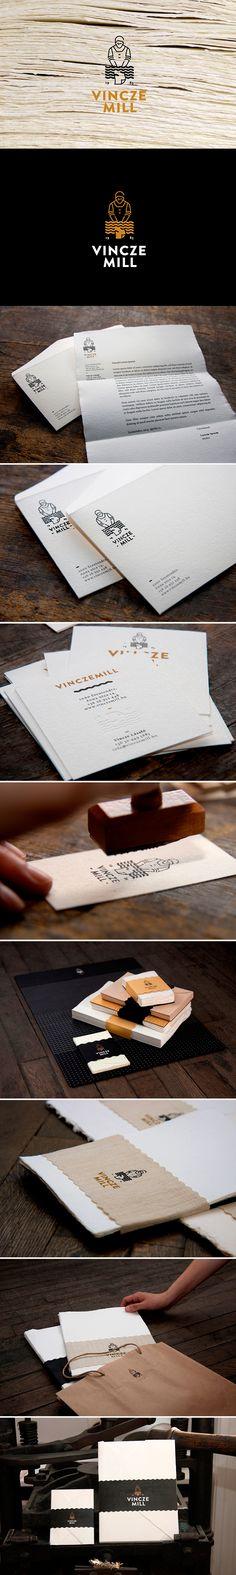 identity / vincze mill / paper mill